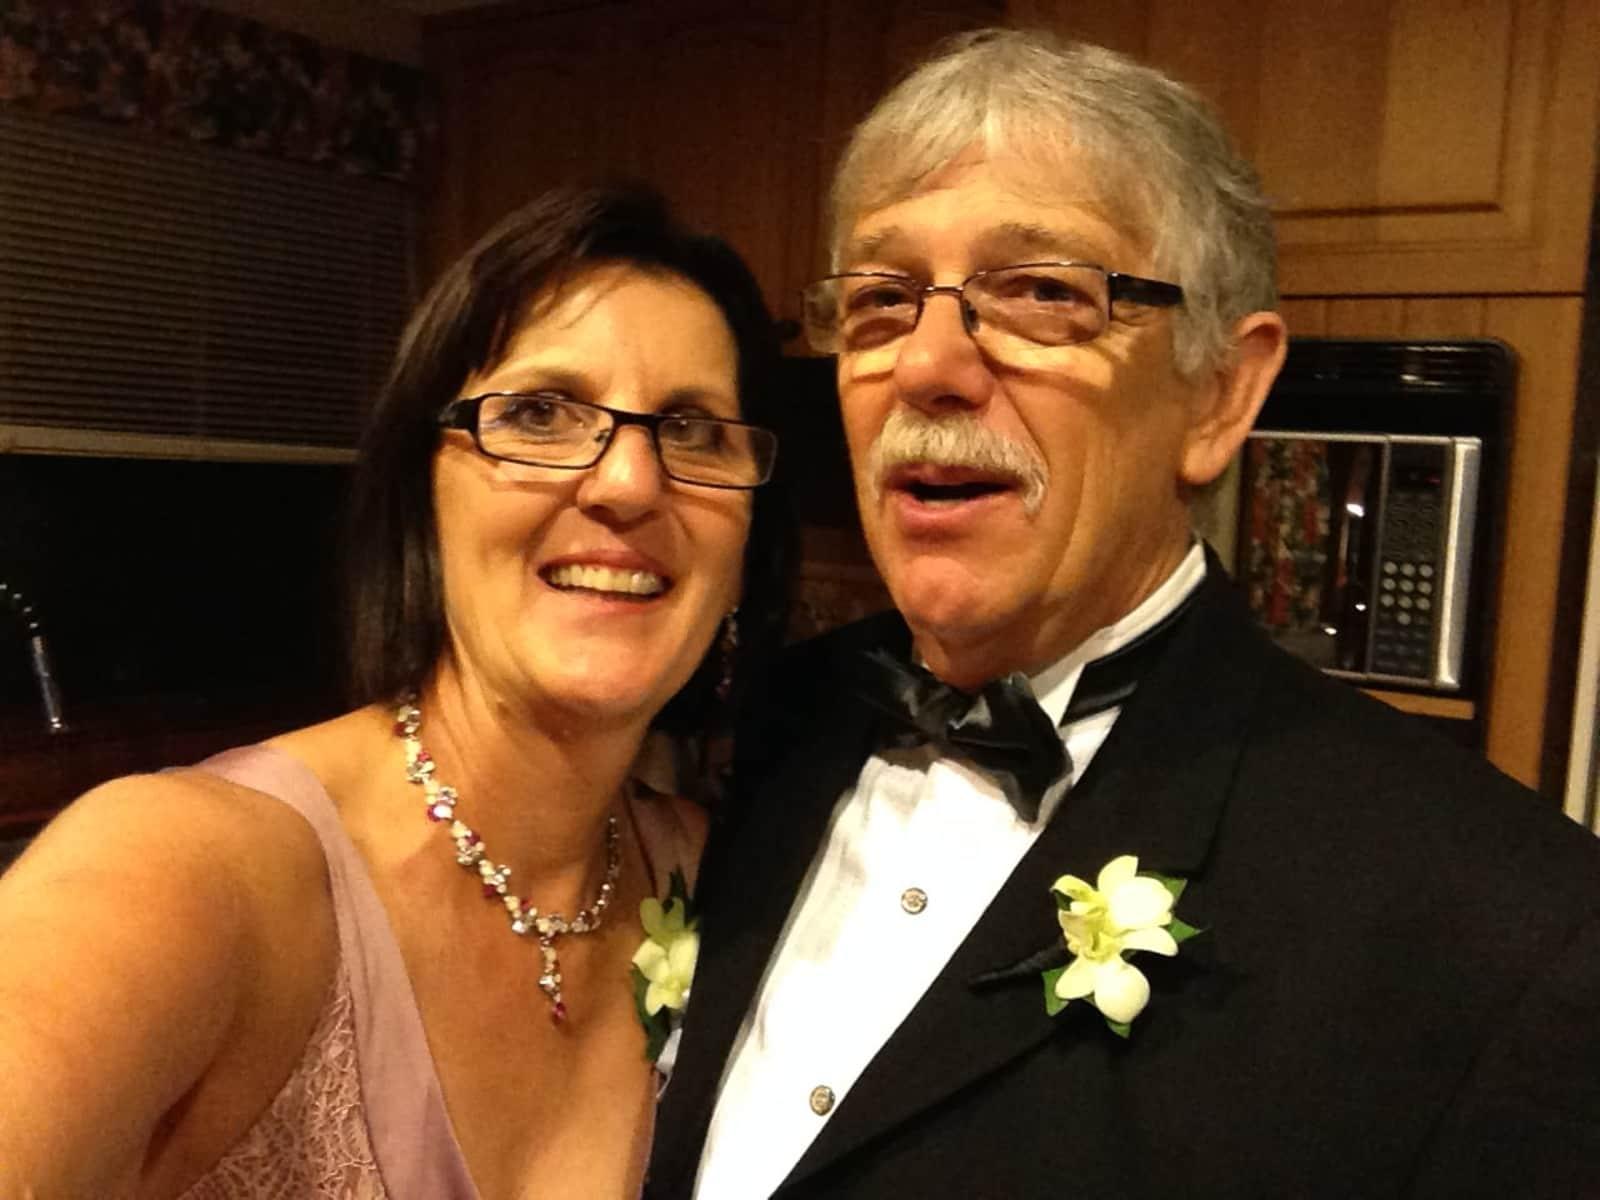 Pauline & Ron from Melbourne, Victoria, Australia